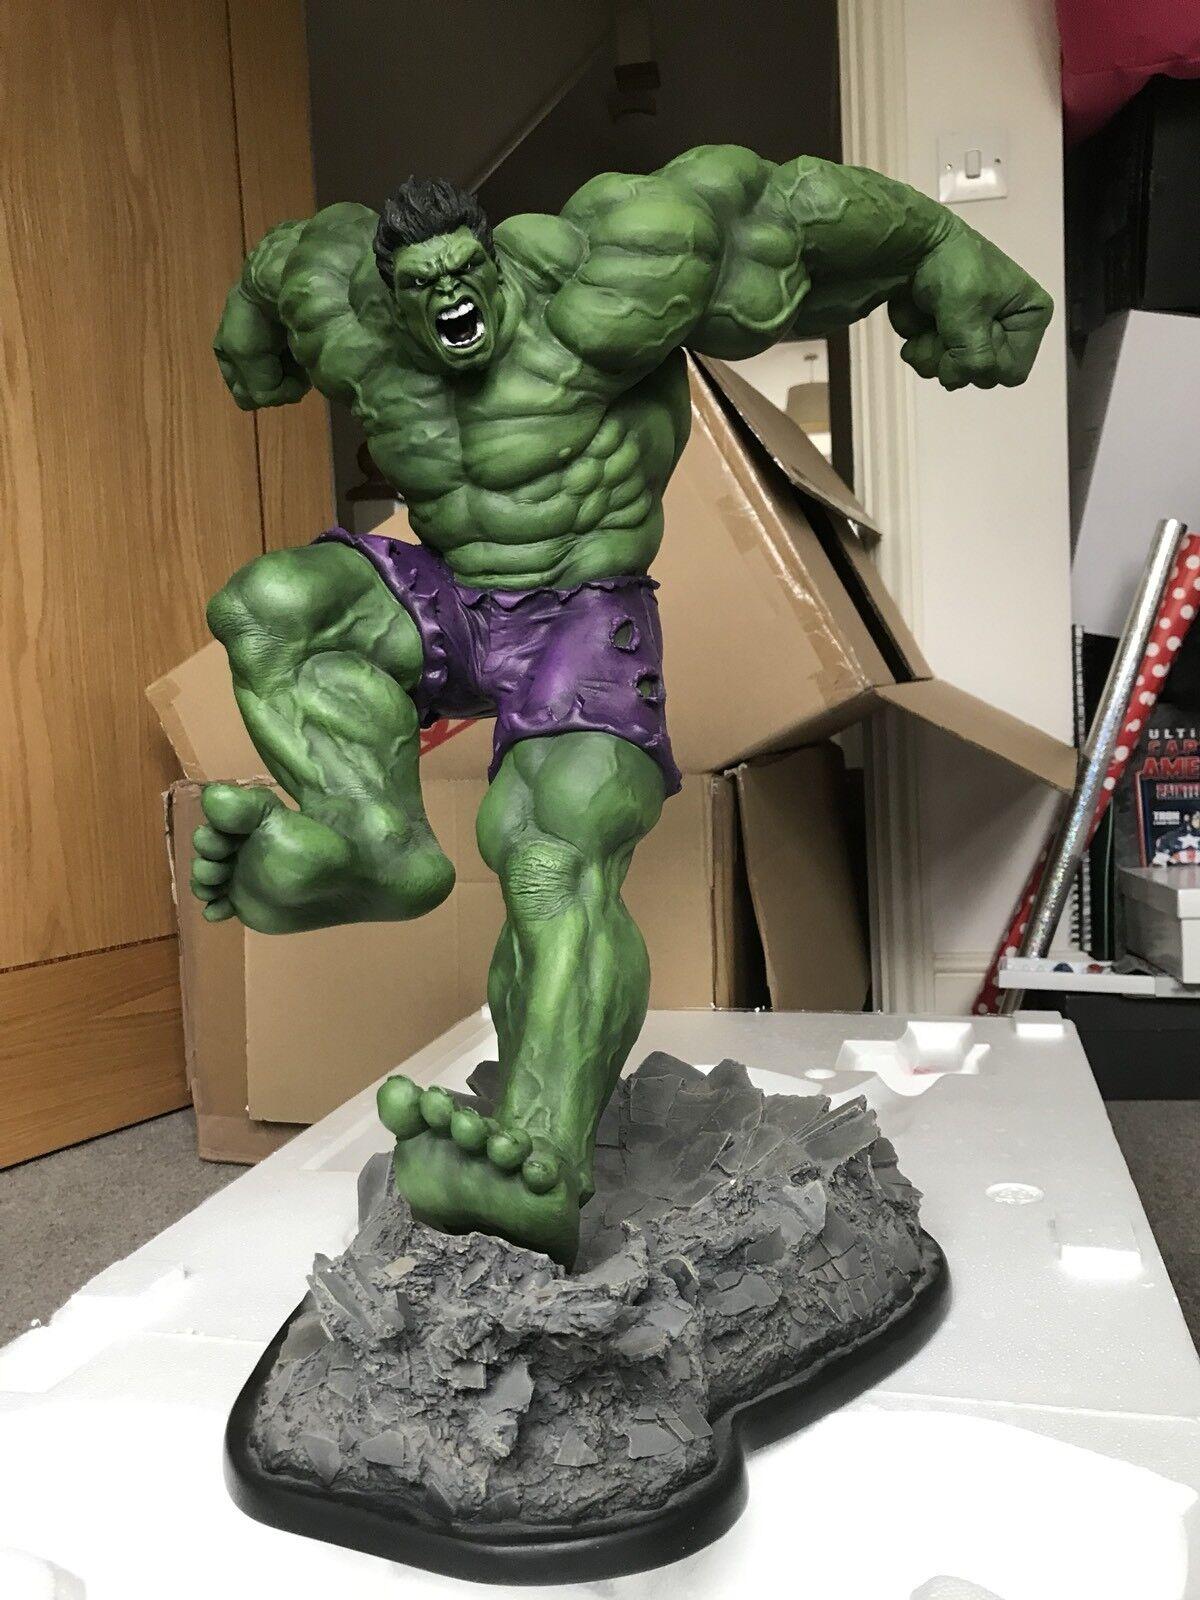 Sideshow Hulk Comiquette Statue Grün Custom 1/5 Scale No.1173/1750 Authentic